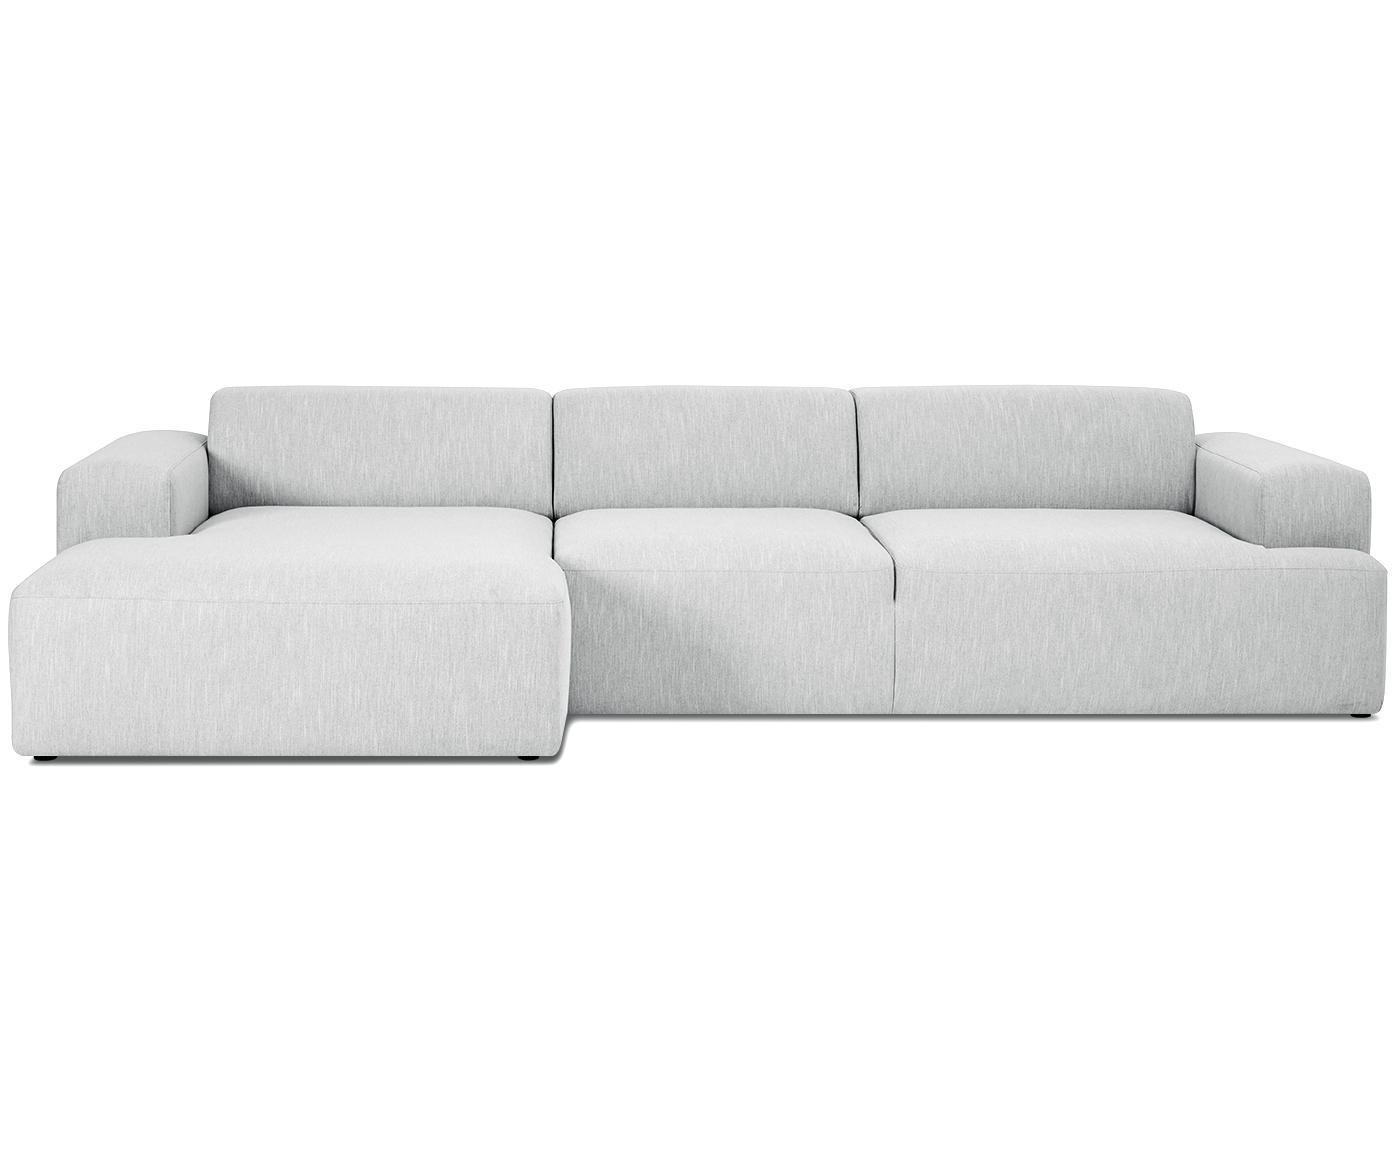 Ecksofa Melva (4-Sitzer), Bezug: Polyester 35.000 Scheuert, Gestell: Massives Kiefernholz, Spa, Füße: Kiefernholz, Webstoff Hellgrau, B 319 x T 144 cm